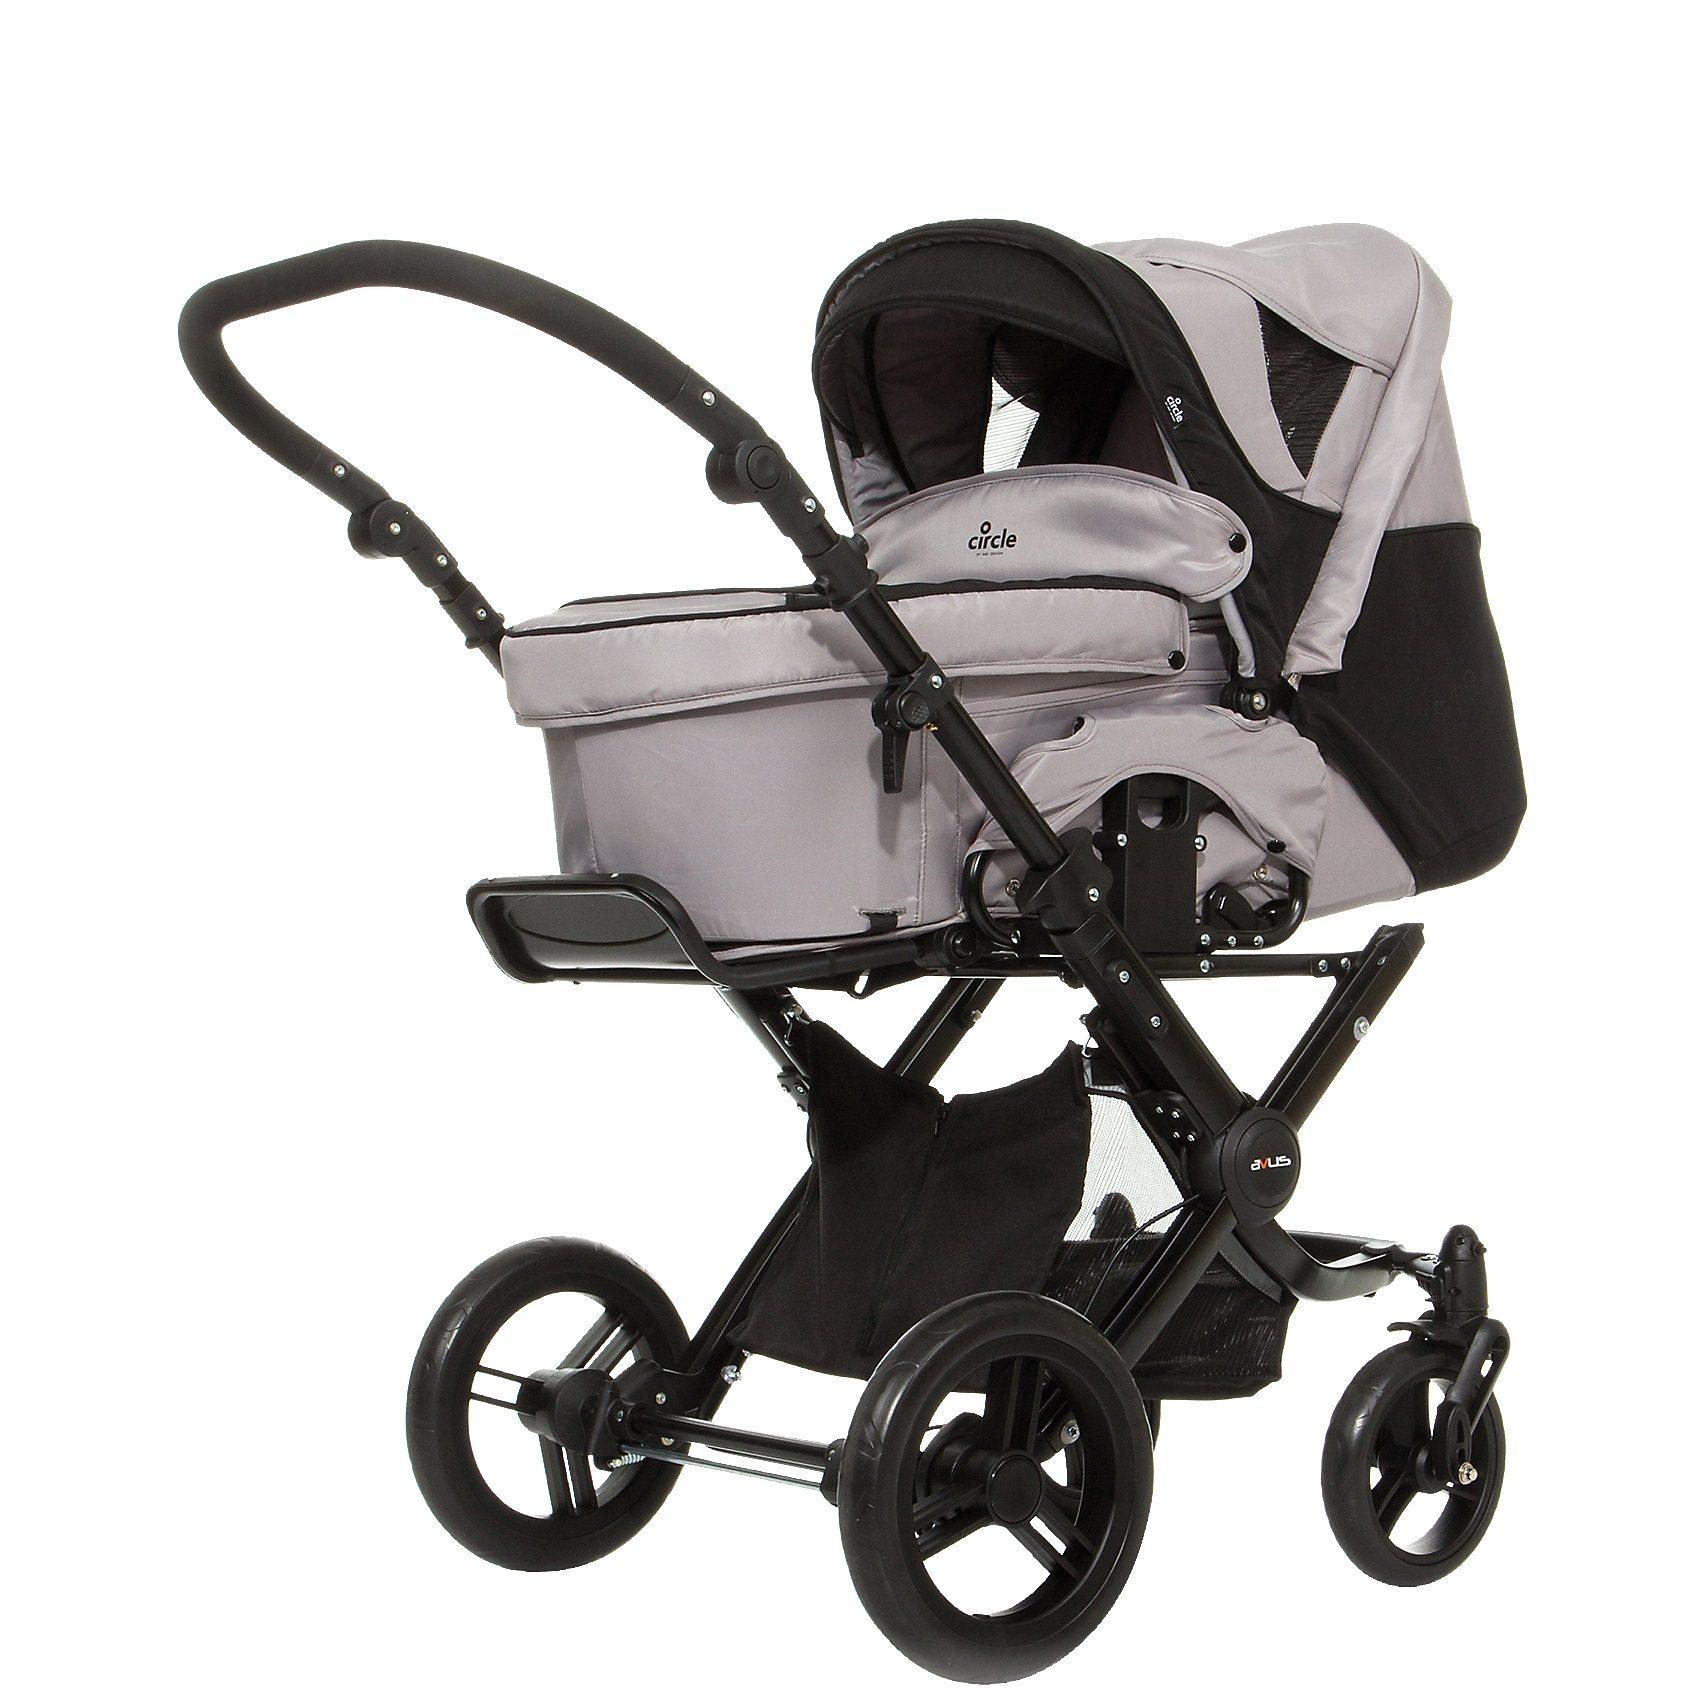 ABC Design Kombi Kinderwagen Ancona, grey black